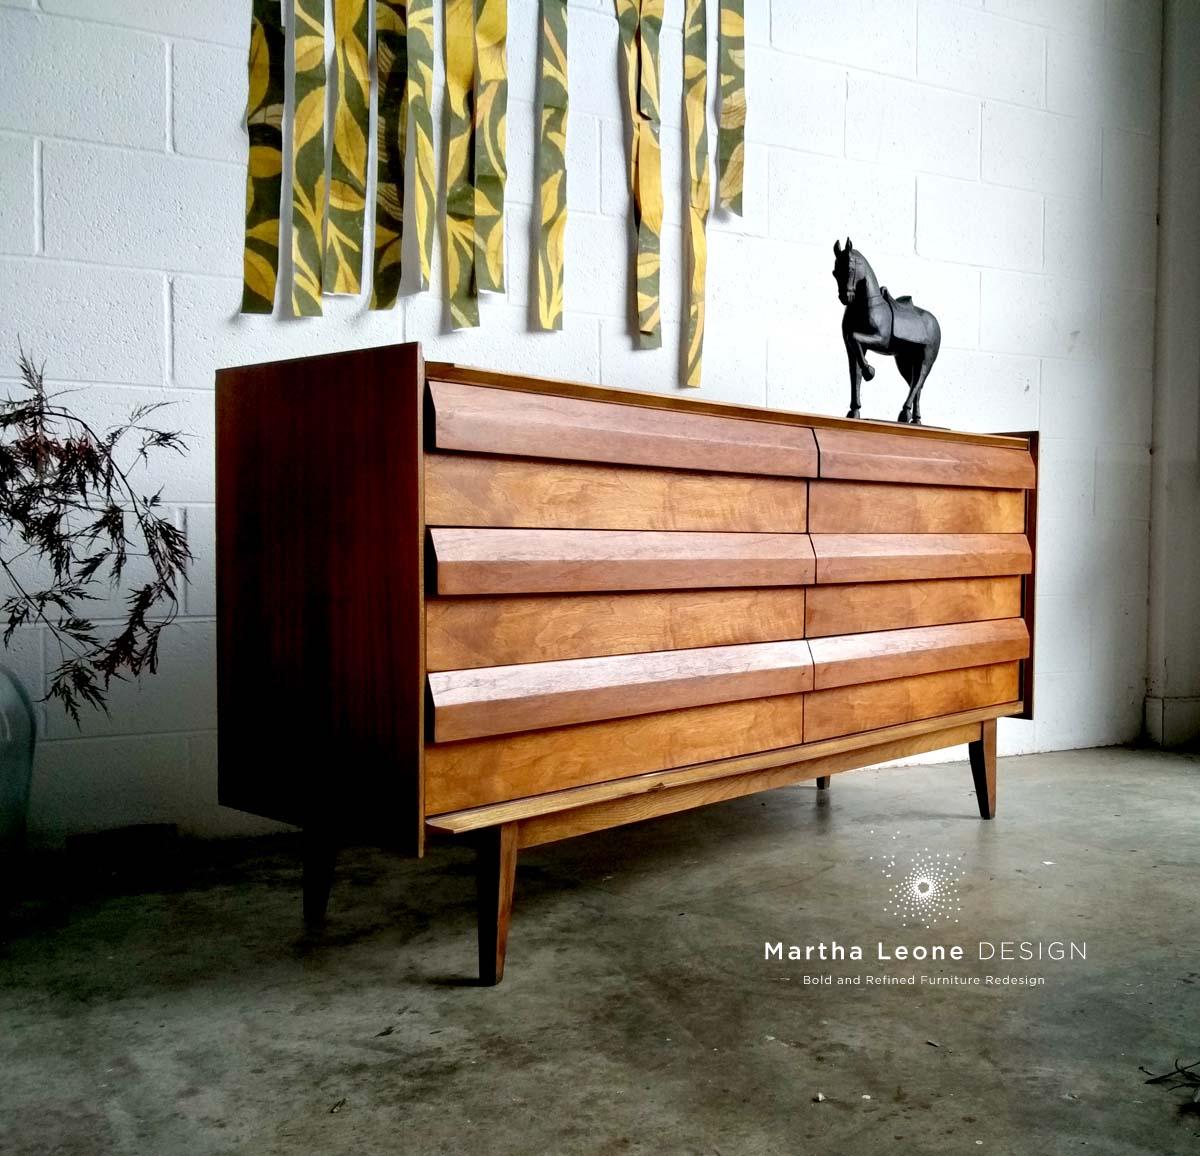 Lane6 Martha Leone Design.jpg